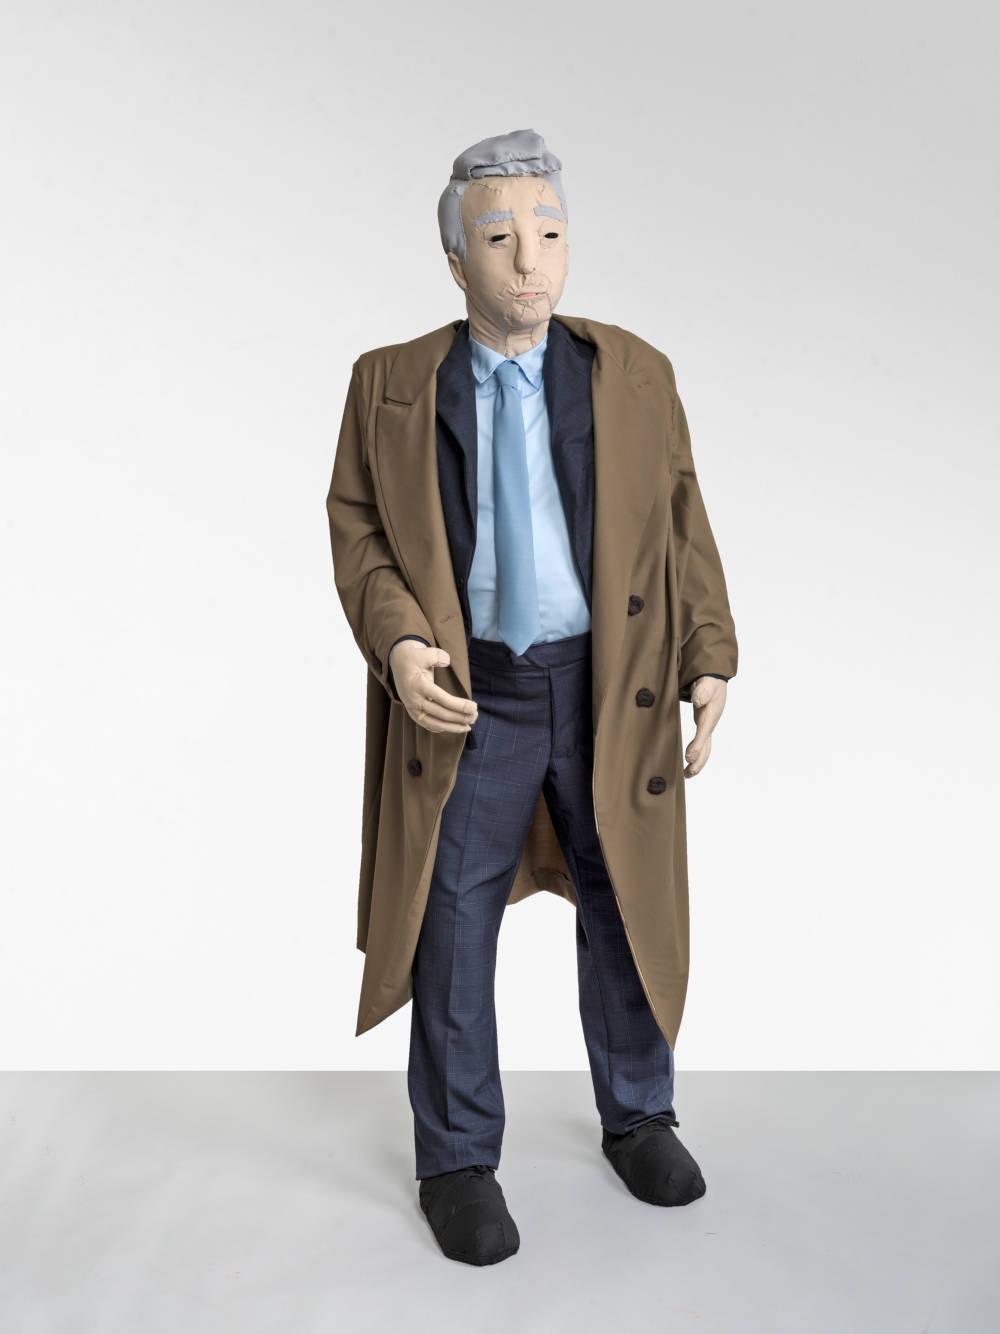 Herr im braunen Mantel (Gentleman in a Brown Coat)